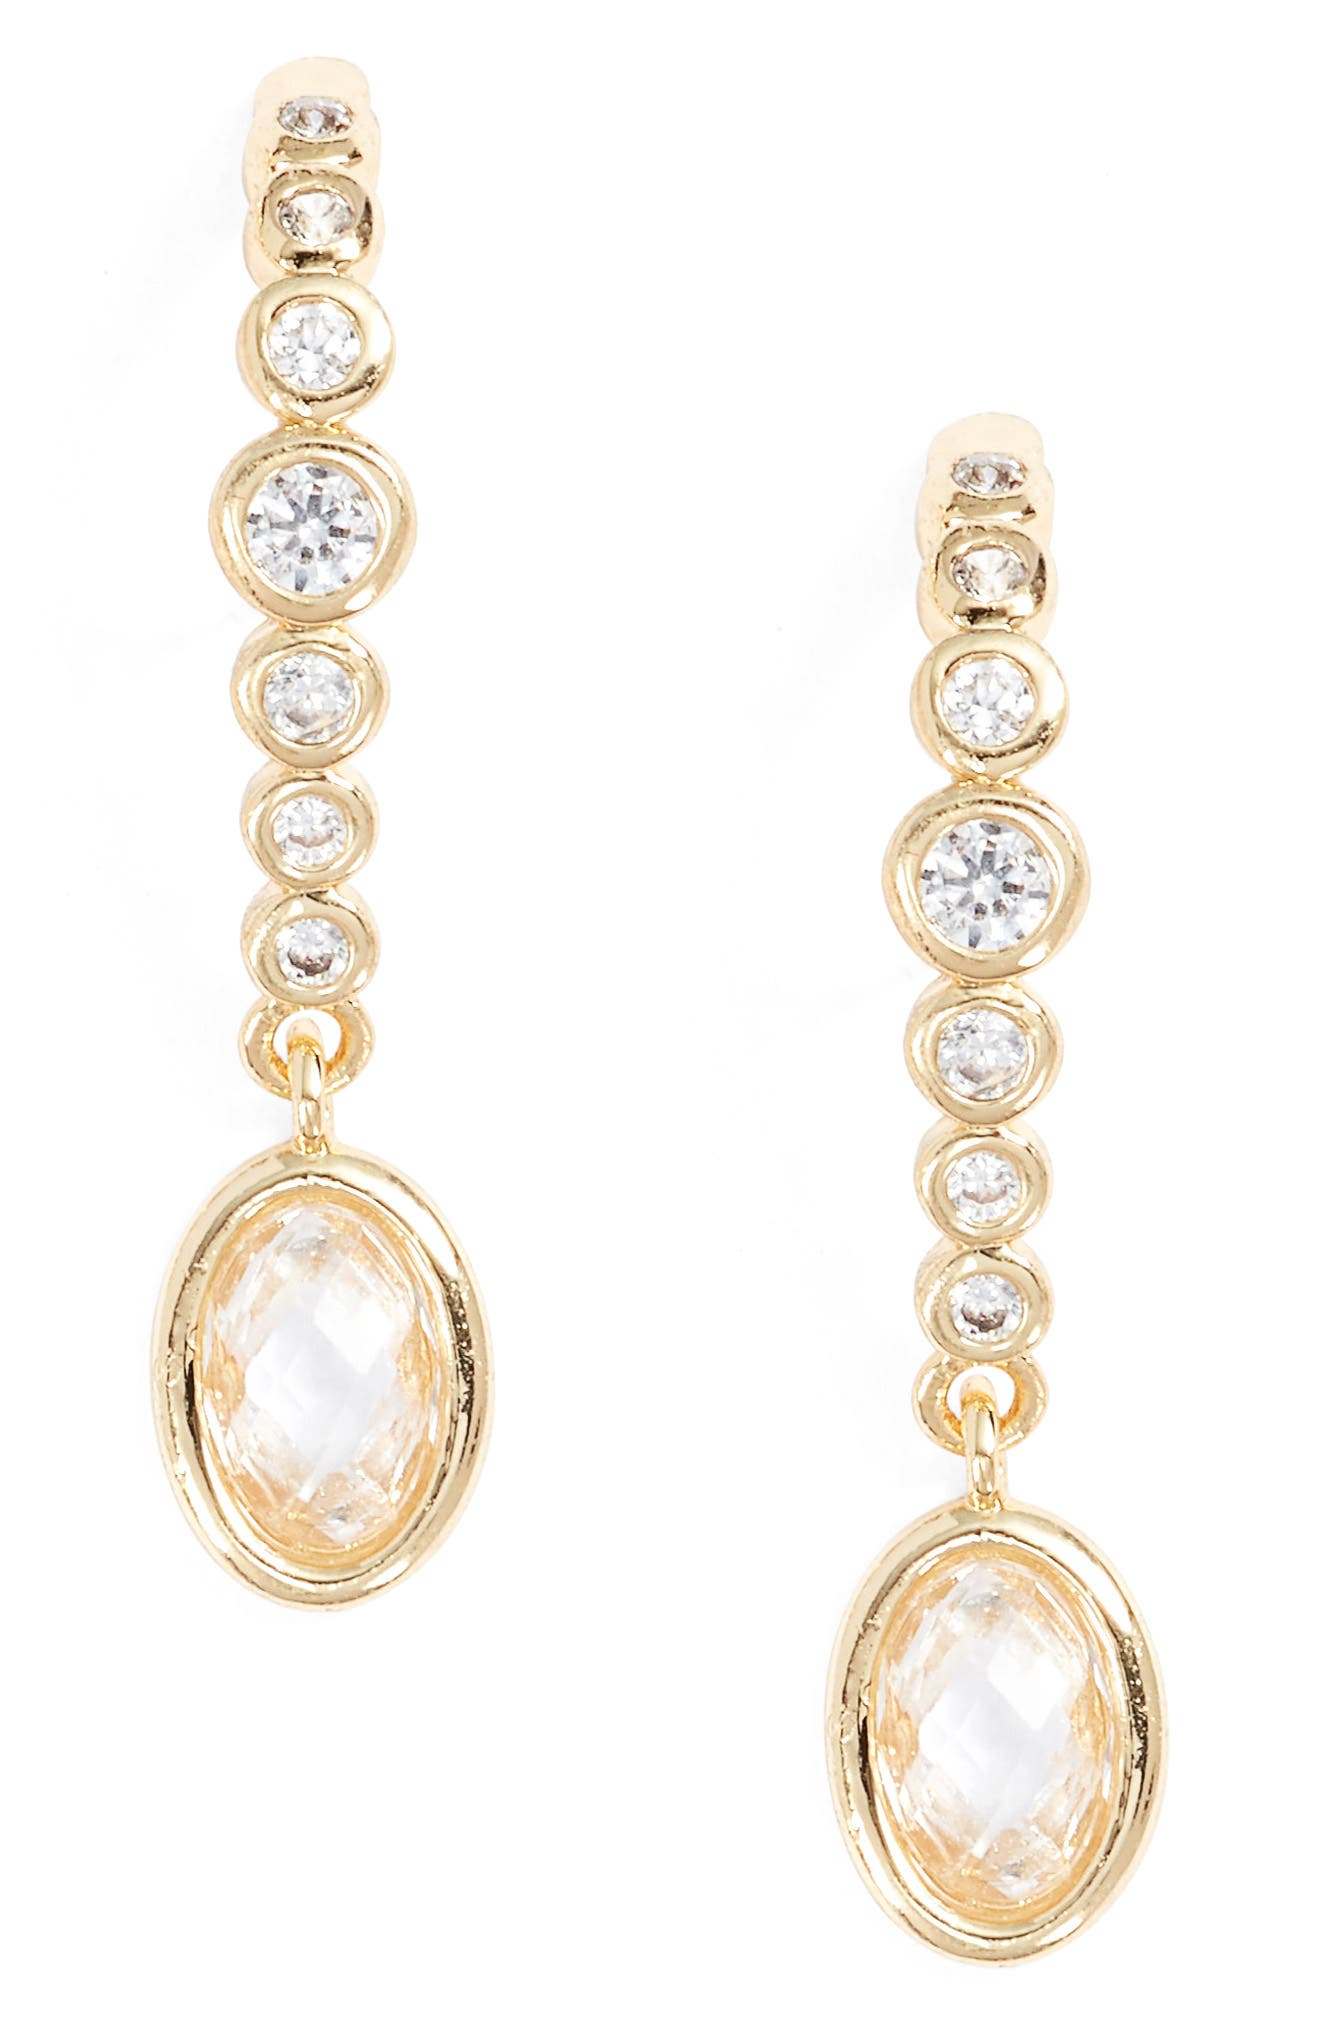 Main Image - Melinda Maria Extended Drop Earrings